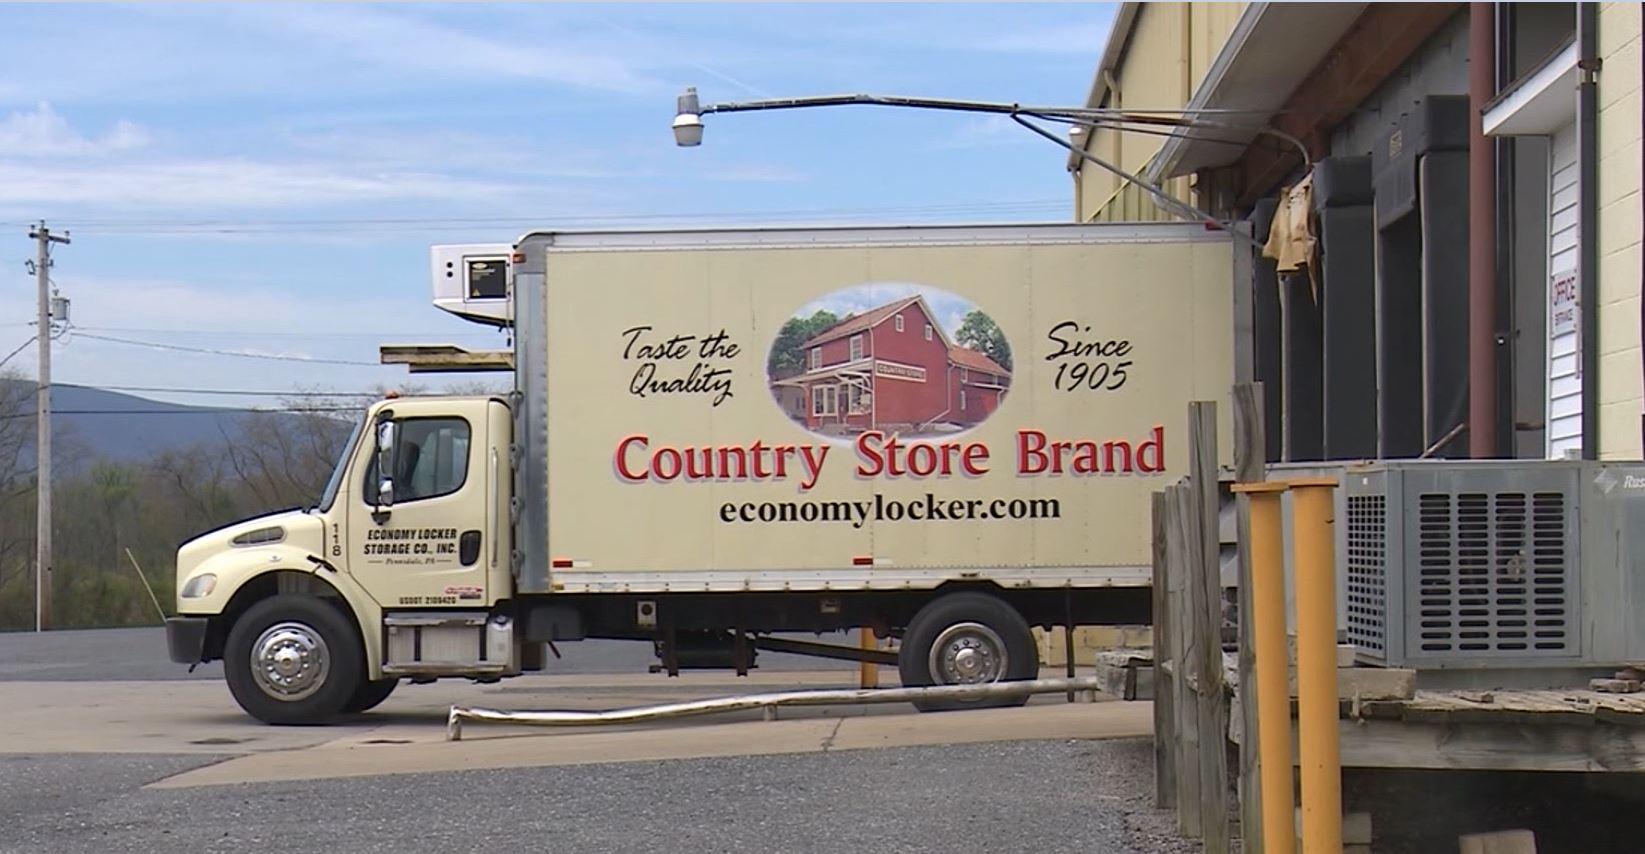 country store brand woman killed meat grinder xyz_1556138581757.JPG.jpg